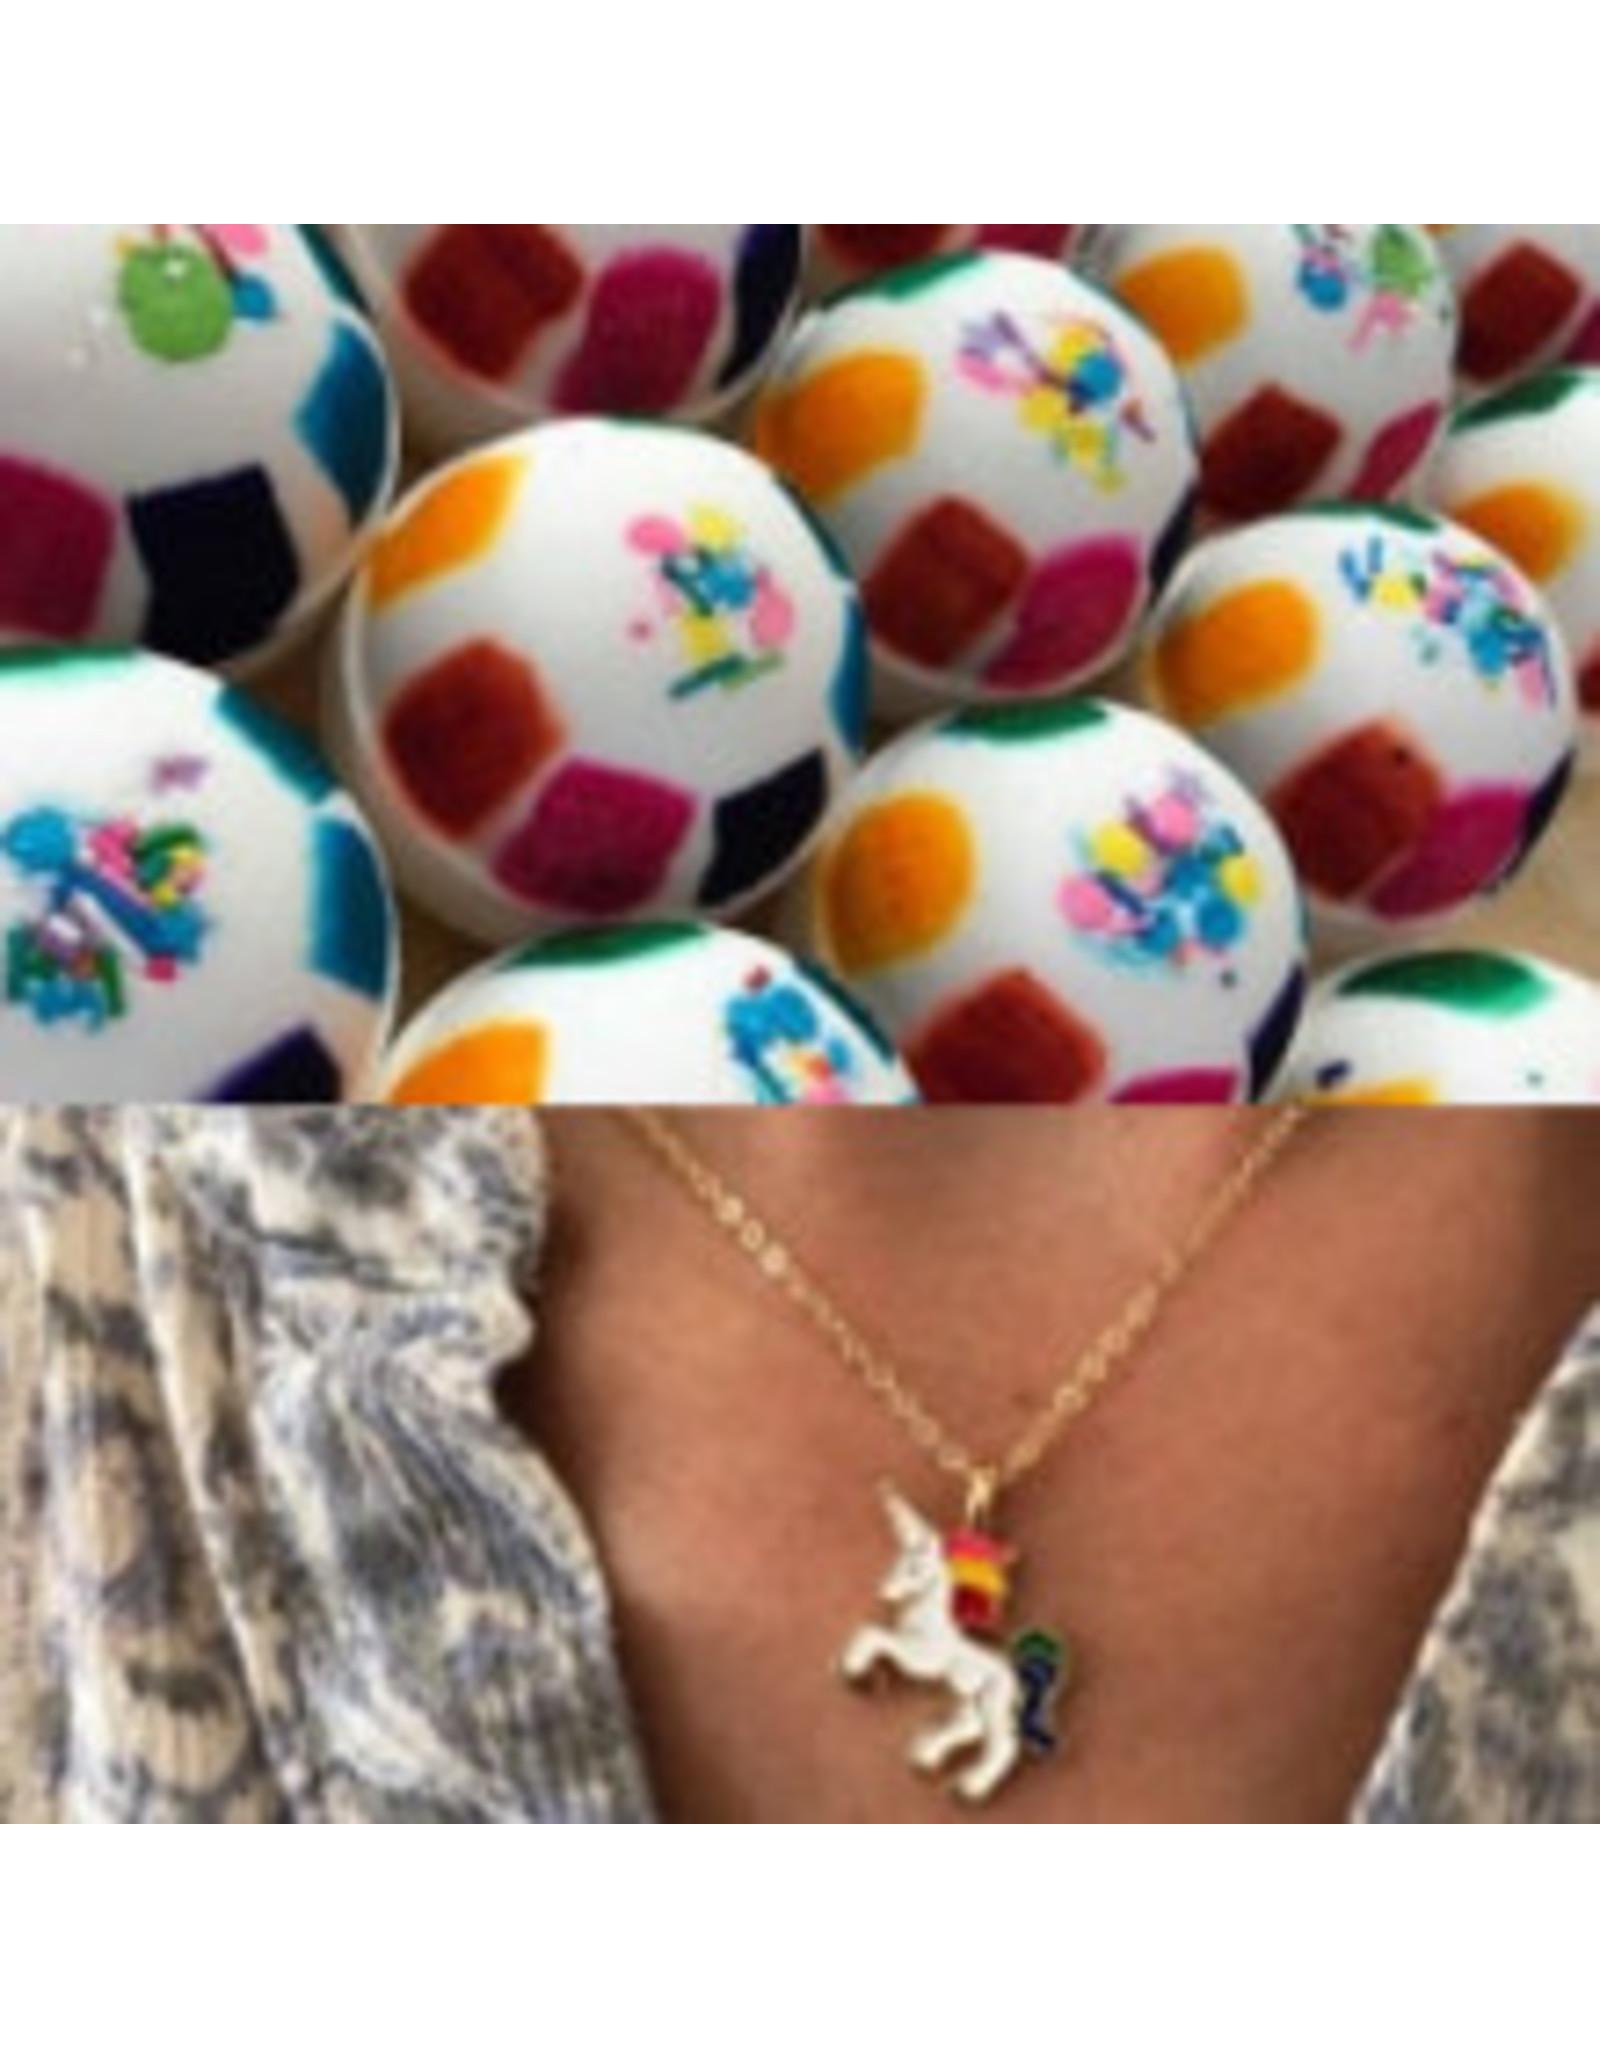 ♥♥ Giant Bath Bomb Unicorn with Necklace inside 260g